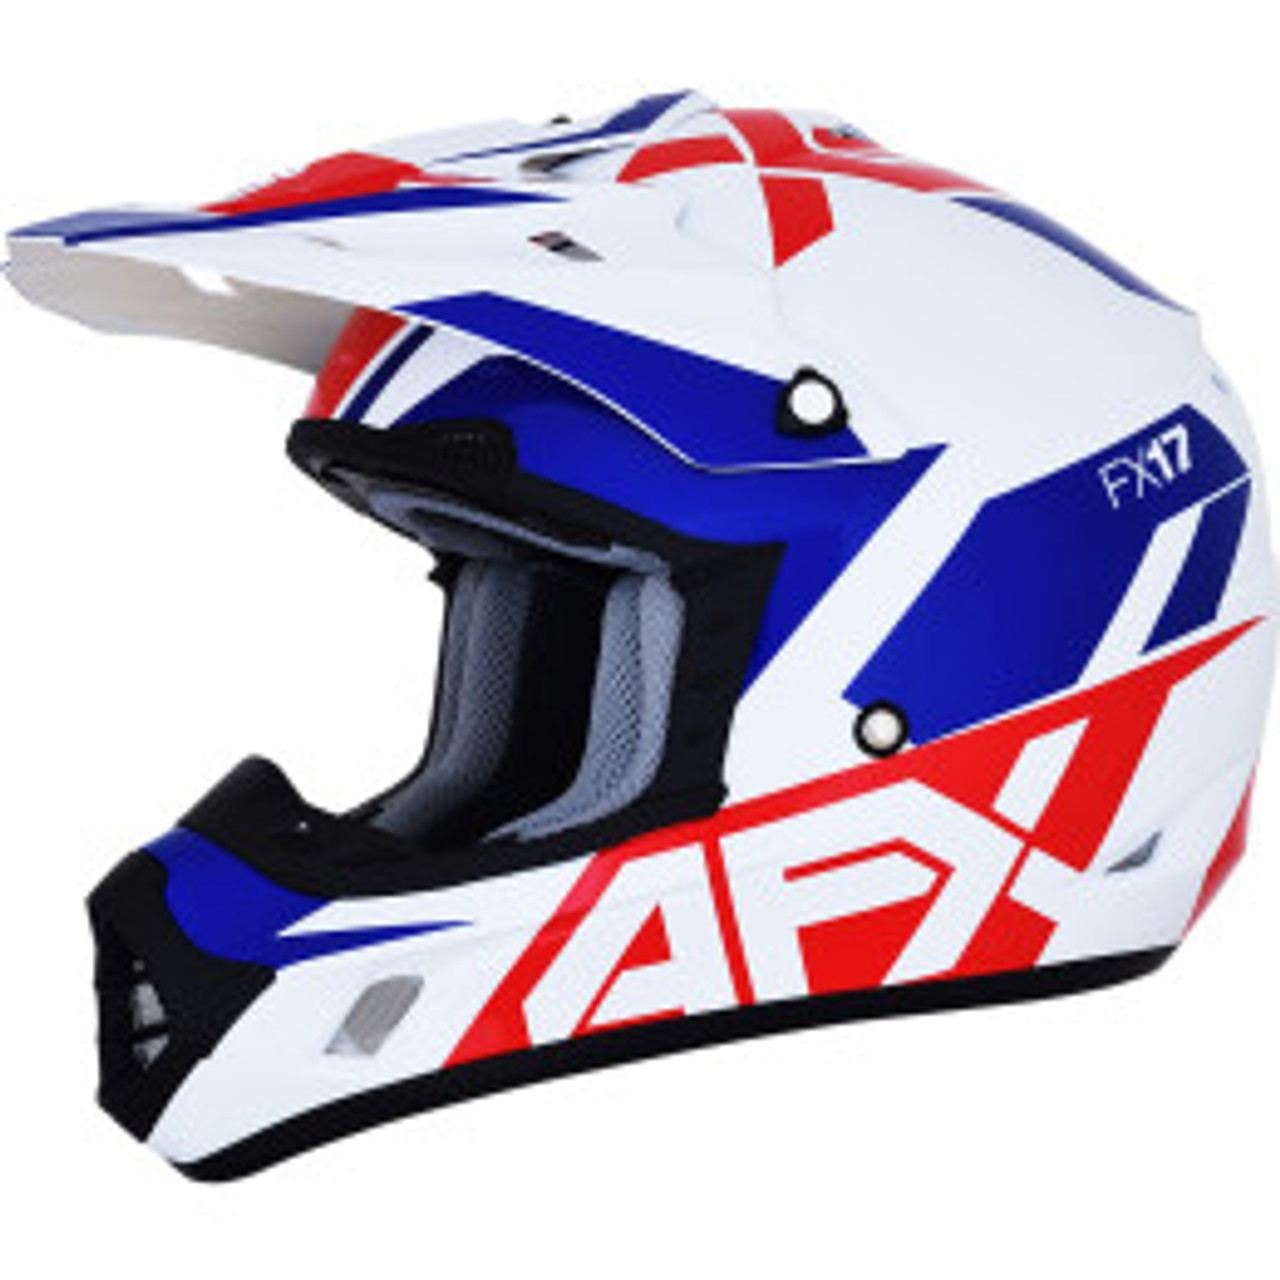 AFX FX 17 Motorcycle Helmet Replacement Liner Multi L